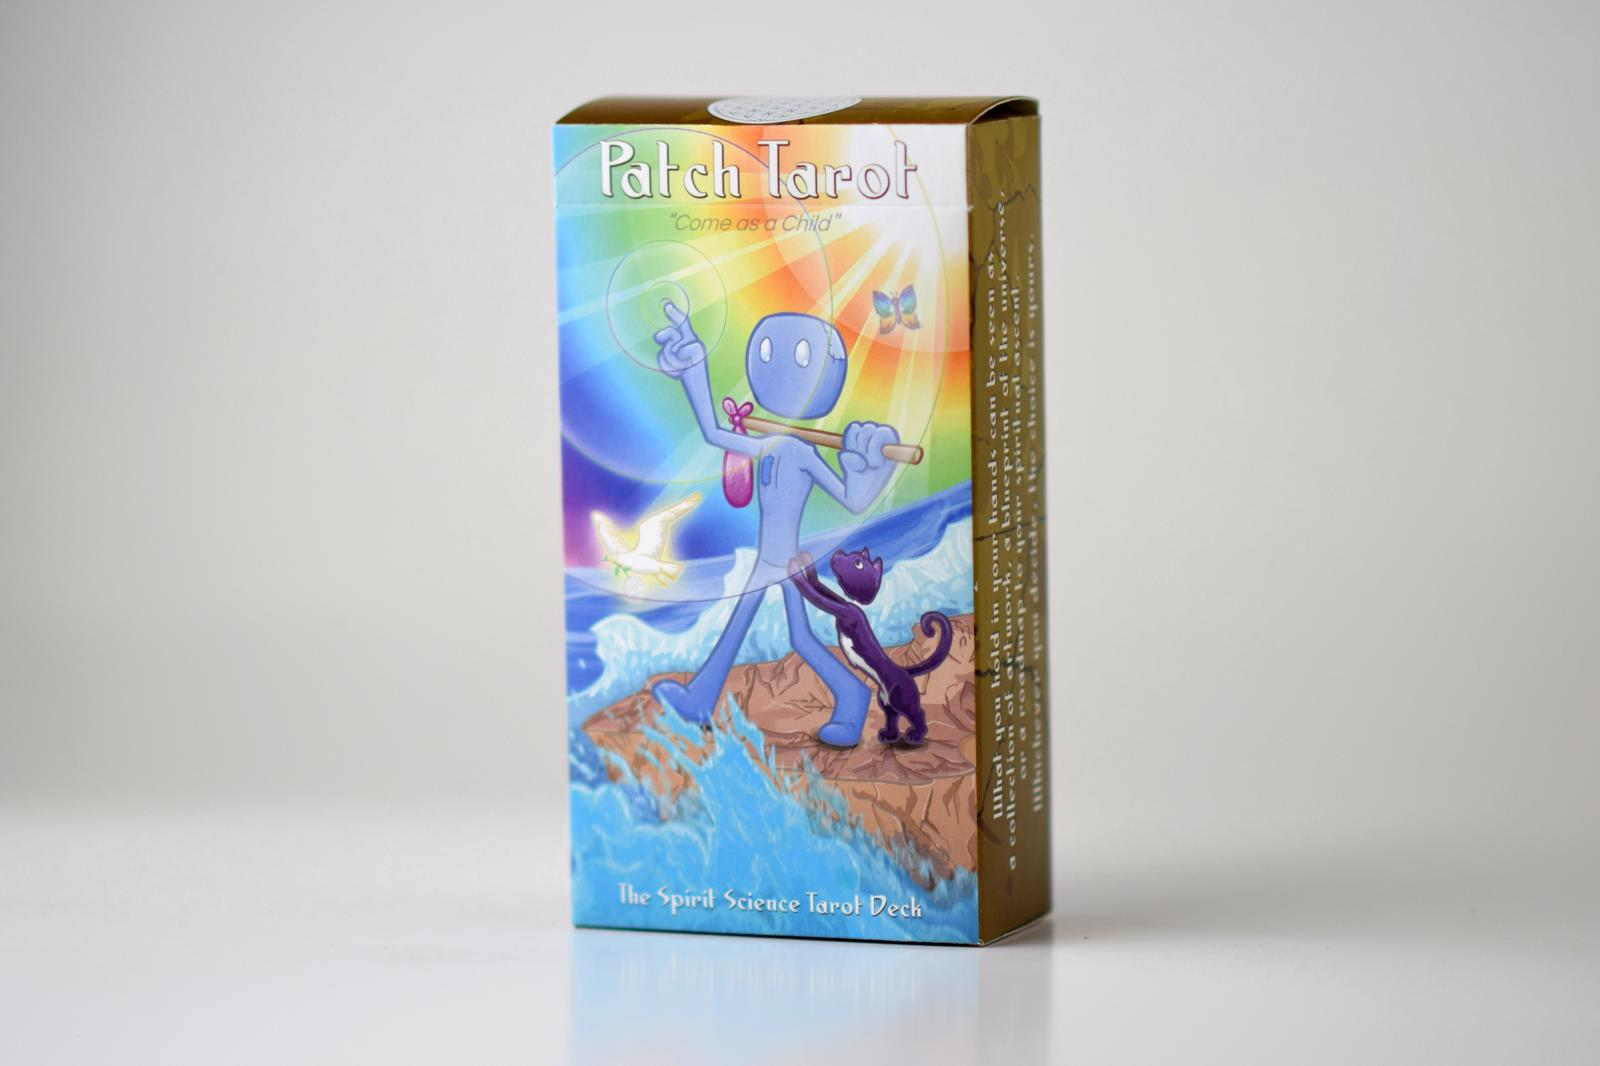 Patch Tarot